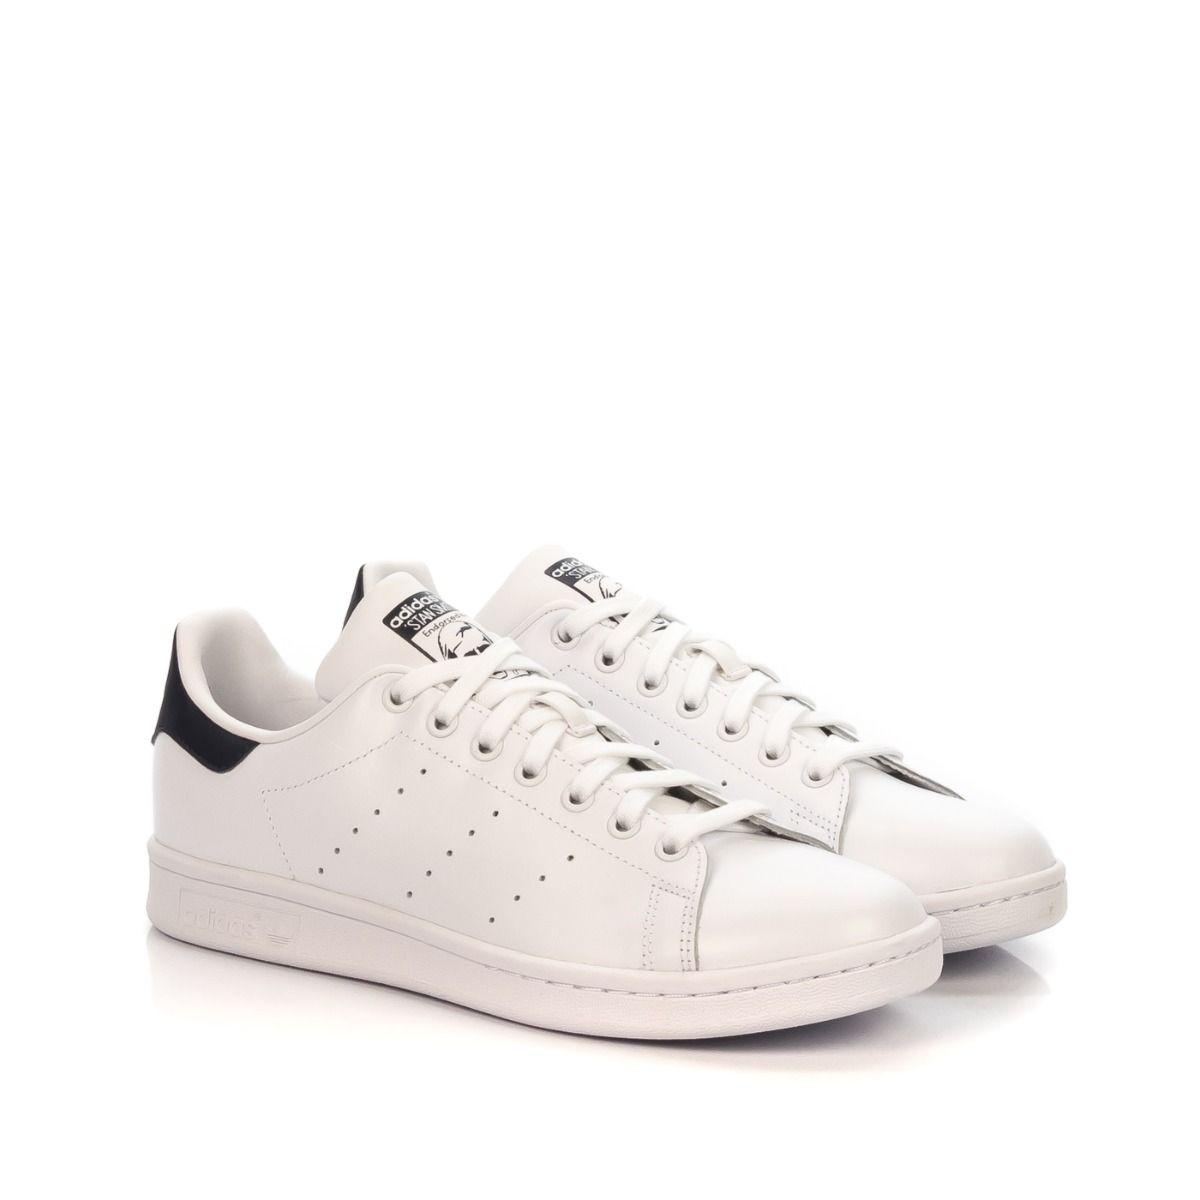 Adidas Beige Treviso Pelle Store adidas Uomo Scarpe Sneakers